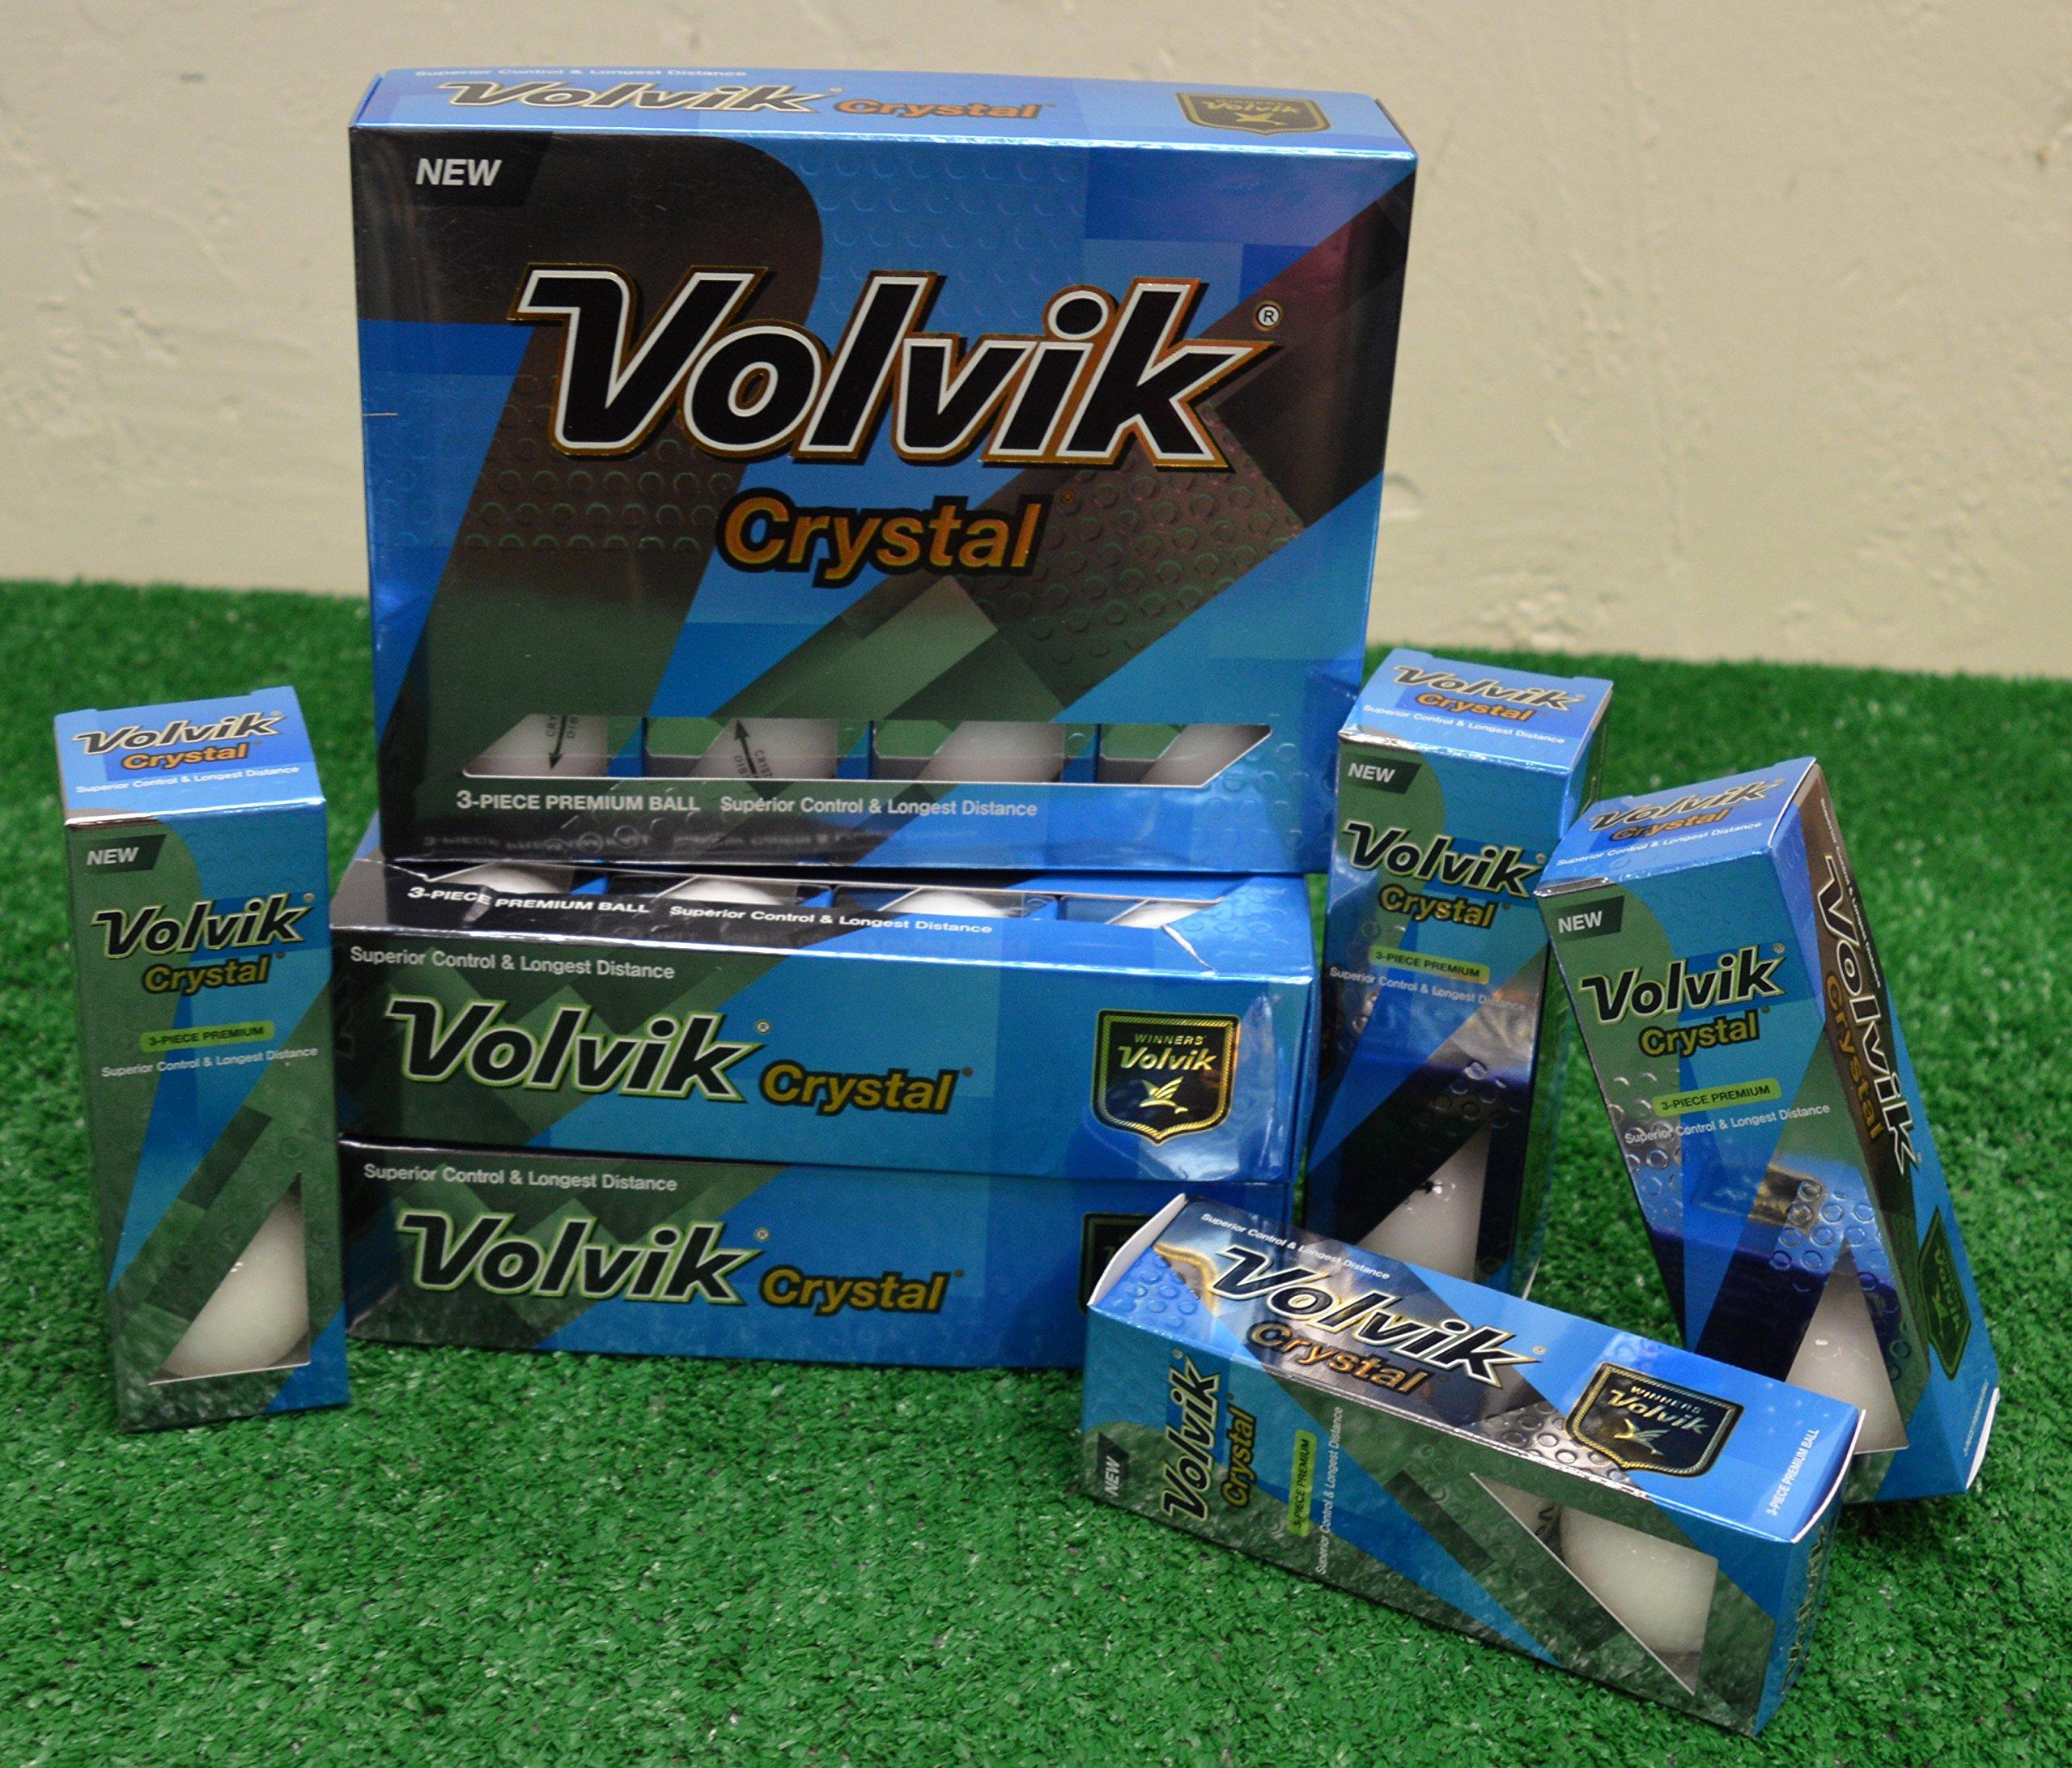 4 Dozen Volvik Crystal White Golf Balls - New in Box